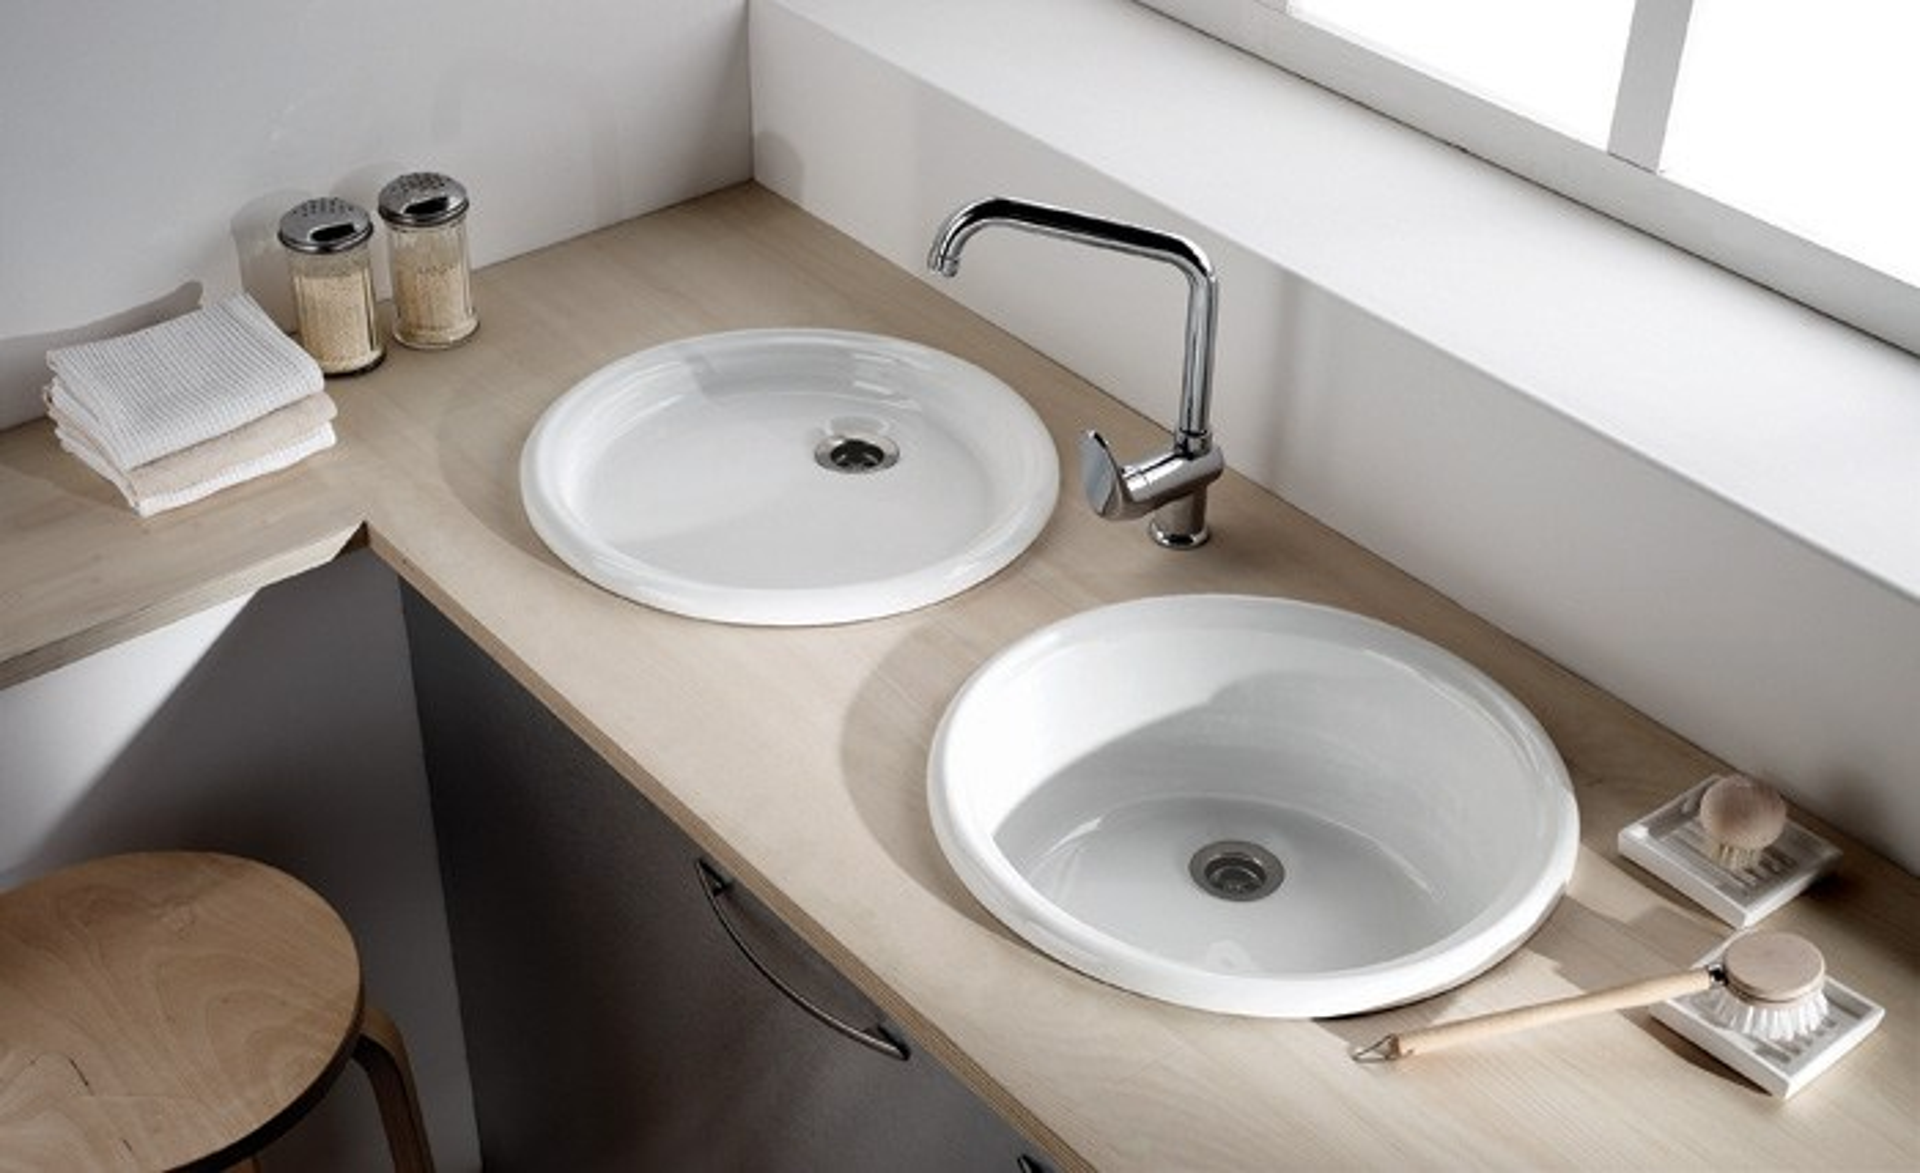 einbauwaschbecken cuba perfecto design. Black Bedroom Furniture Sets. Home Design Ideas